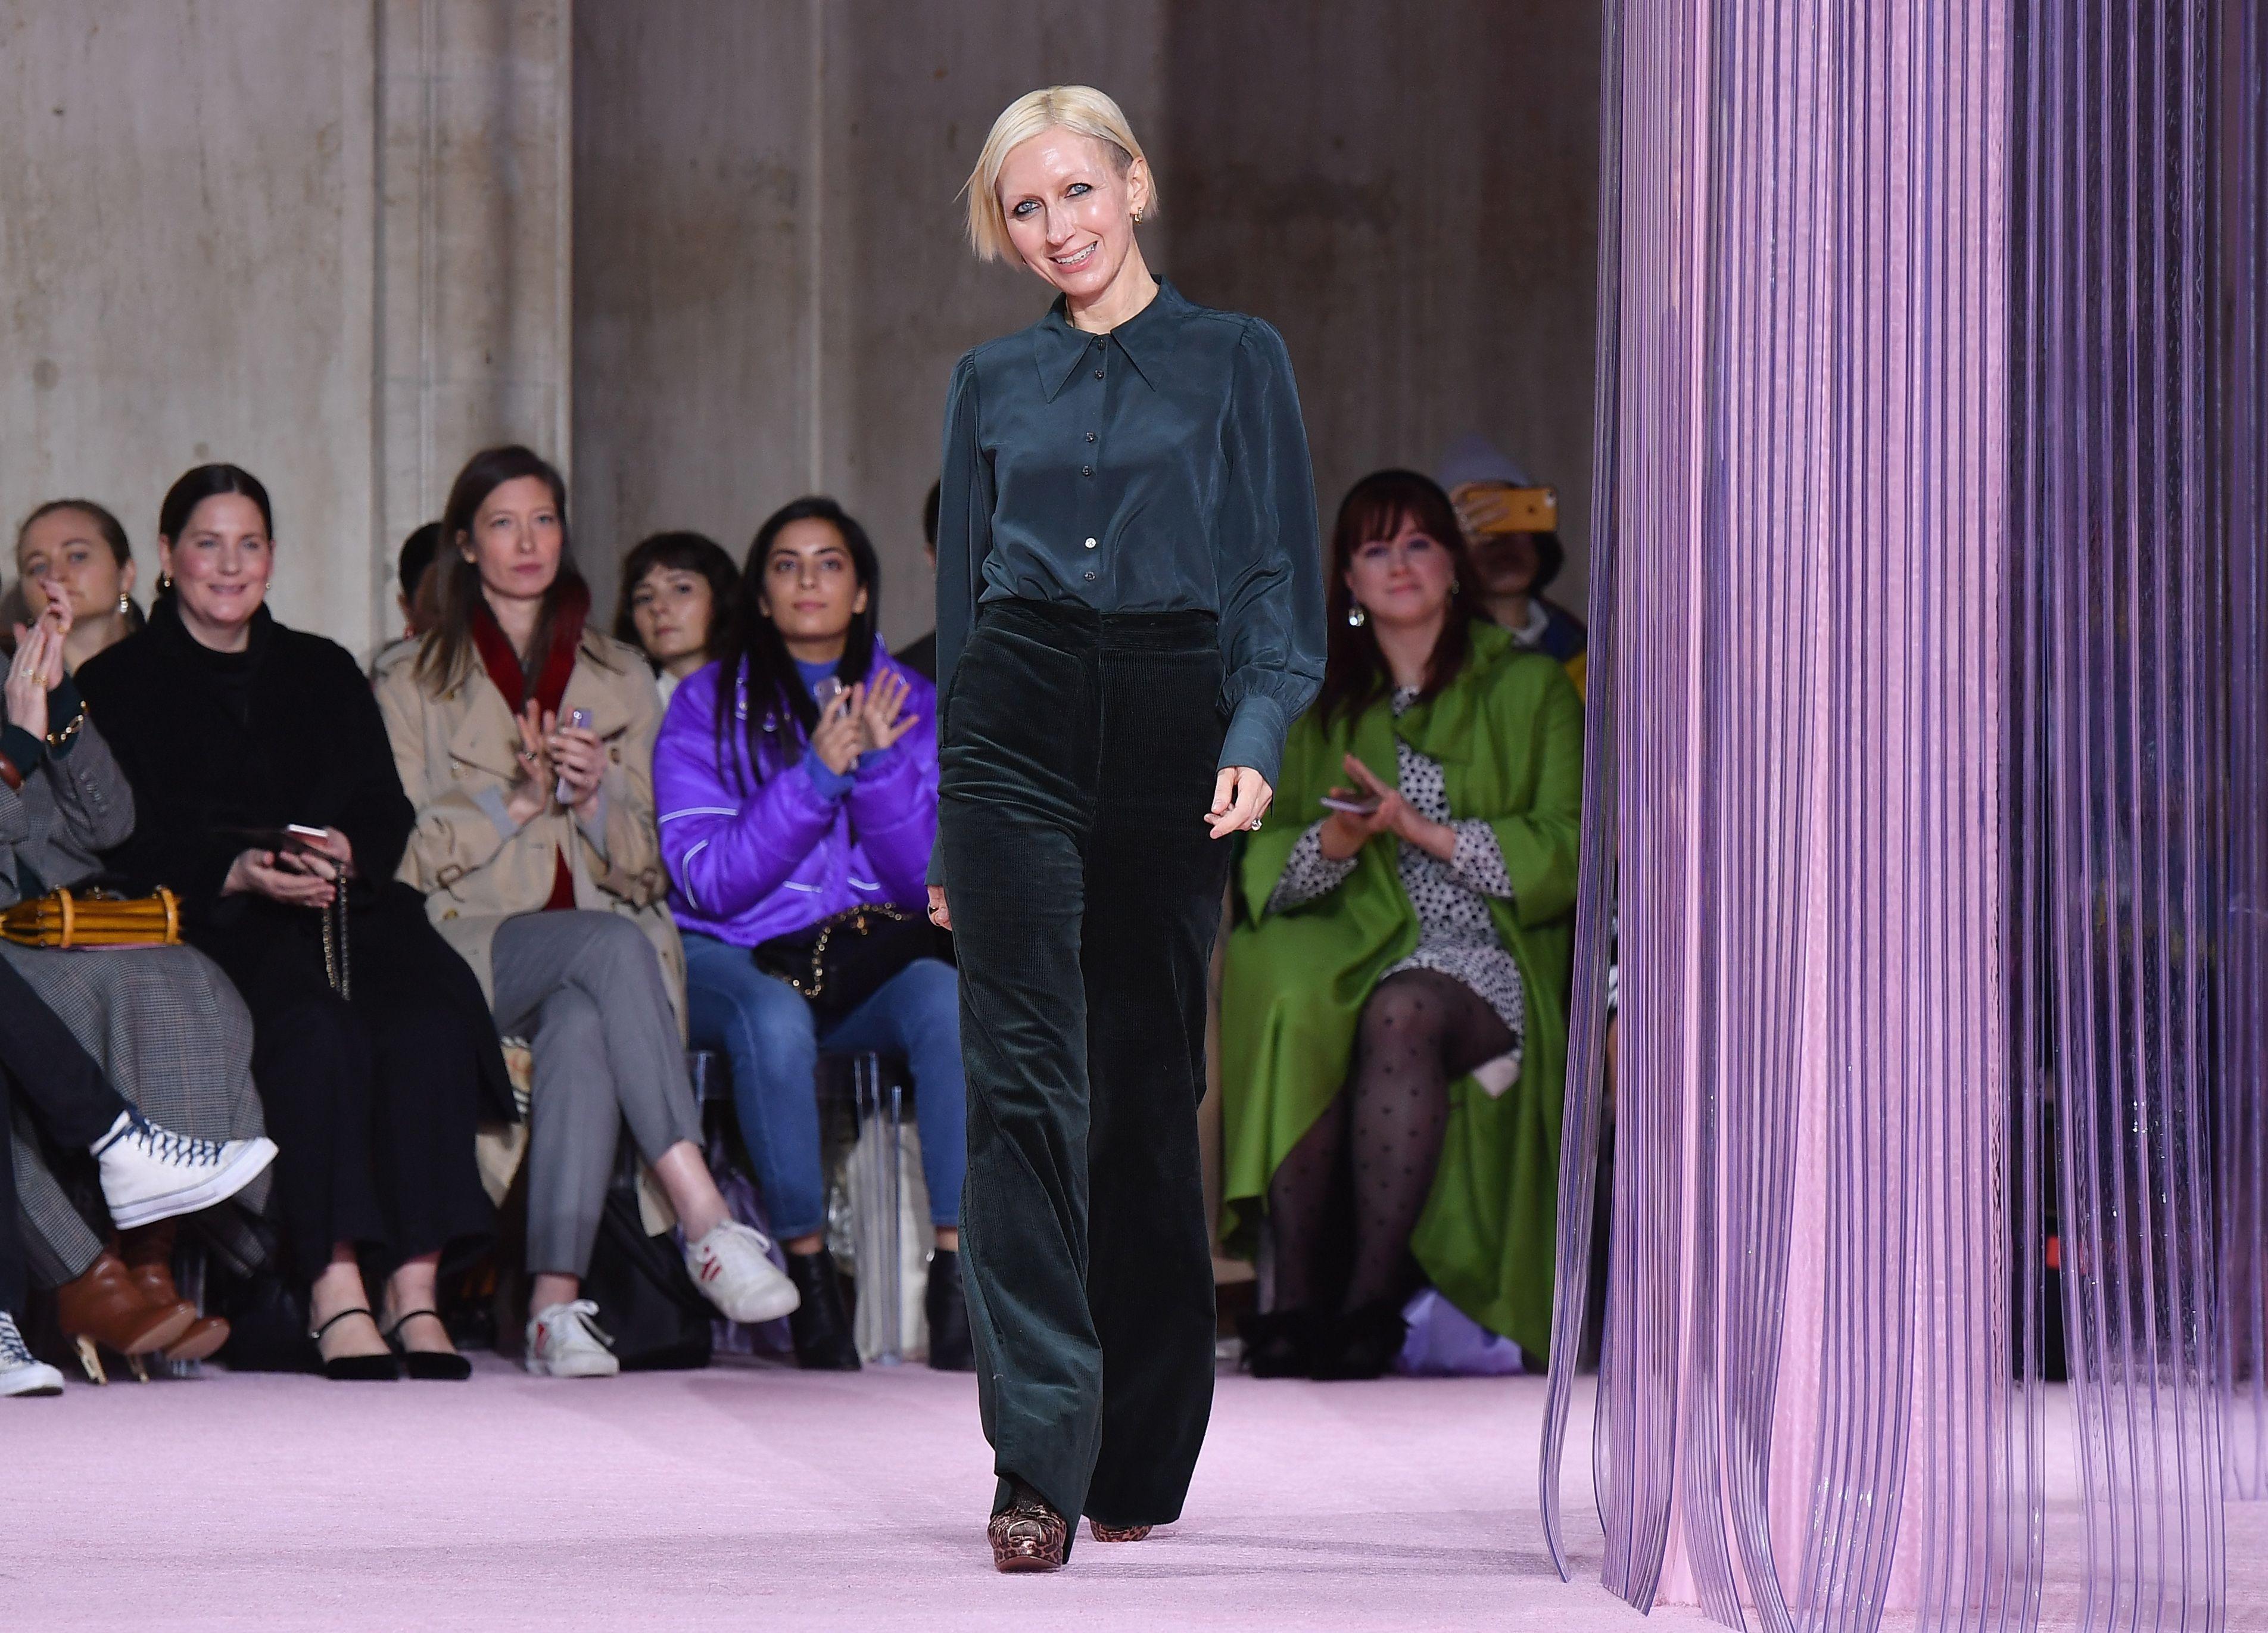 What I Wear to Work: Nicola Glass, Creative Director of Kate Spade New York